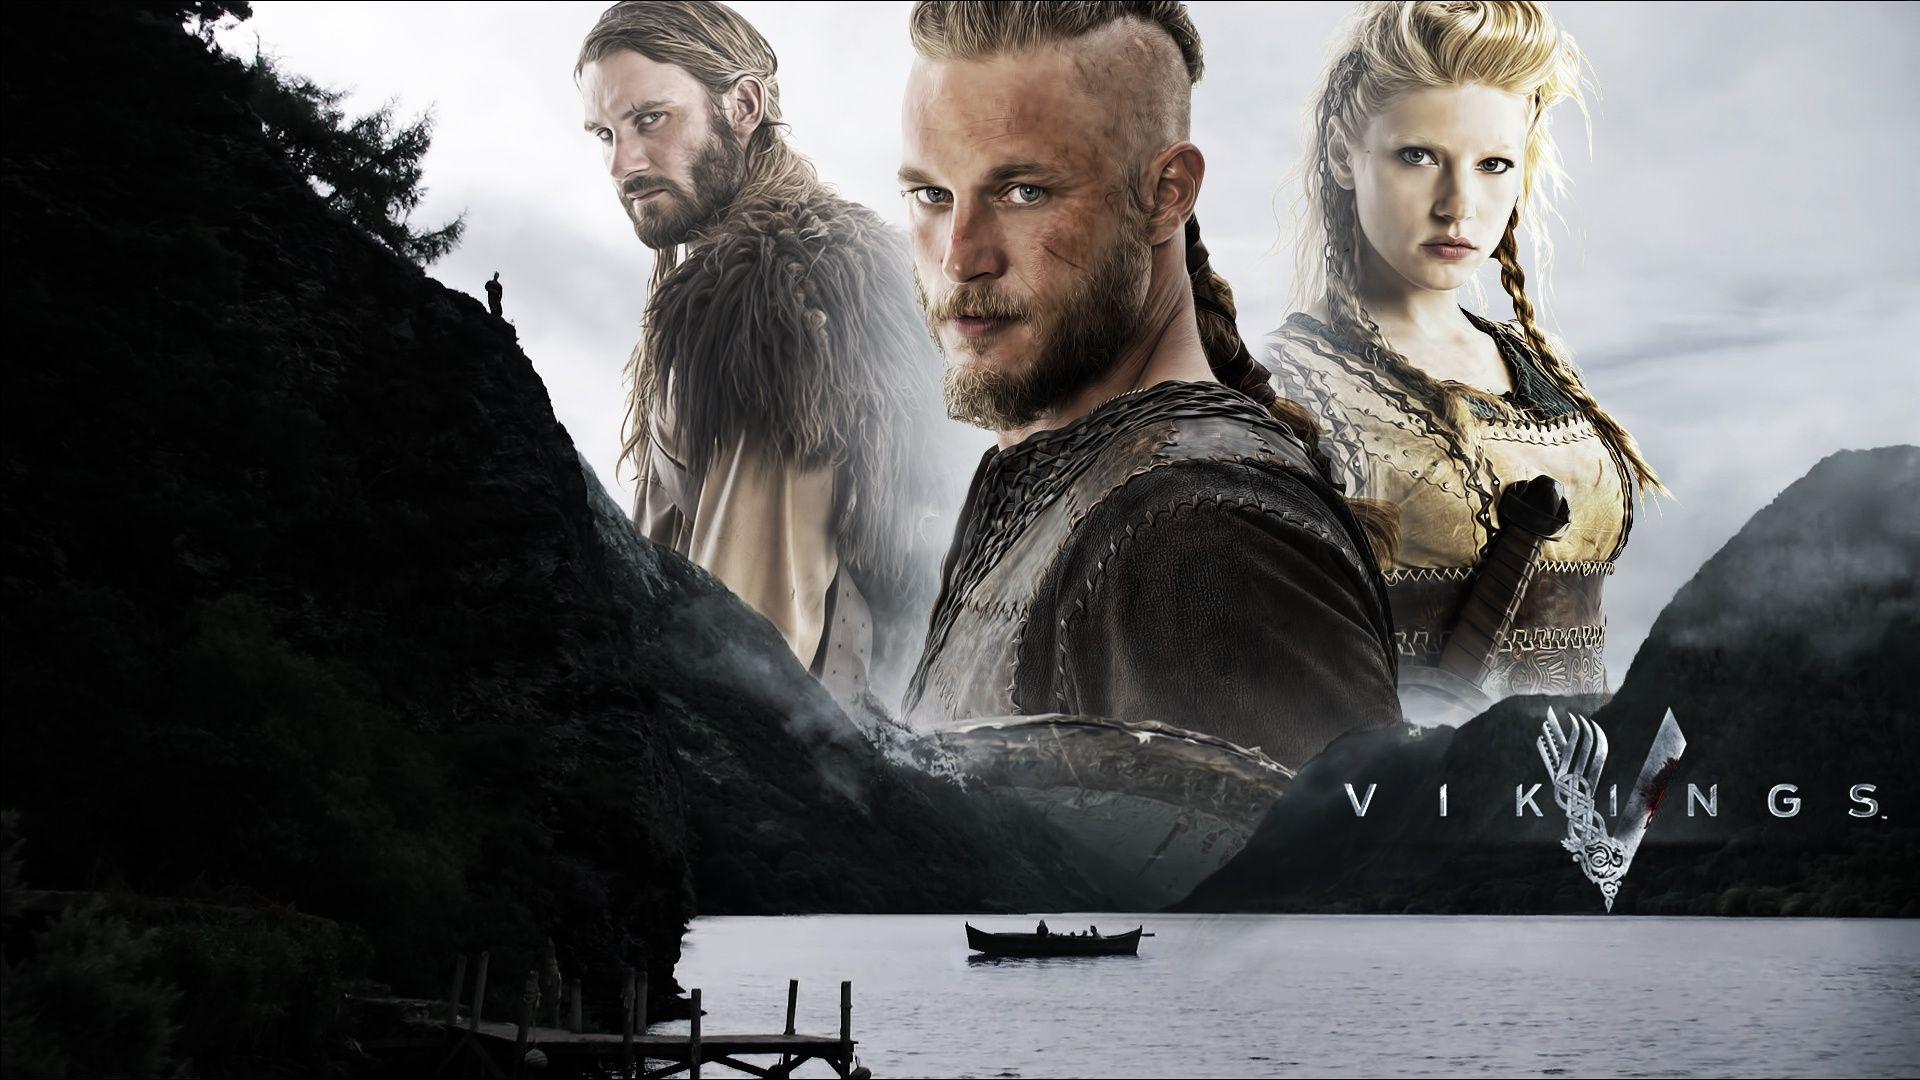 Vikings Wallpapers for Desktop 1920×1080 Vikings